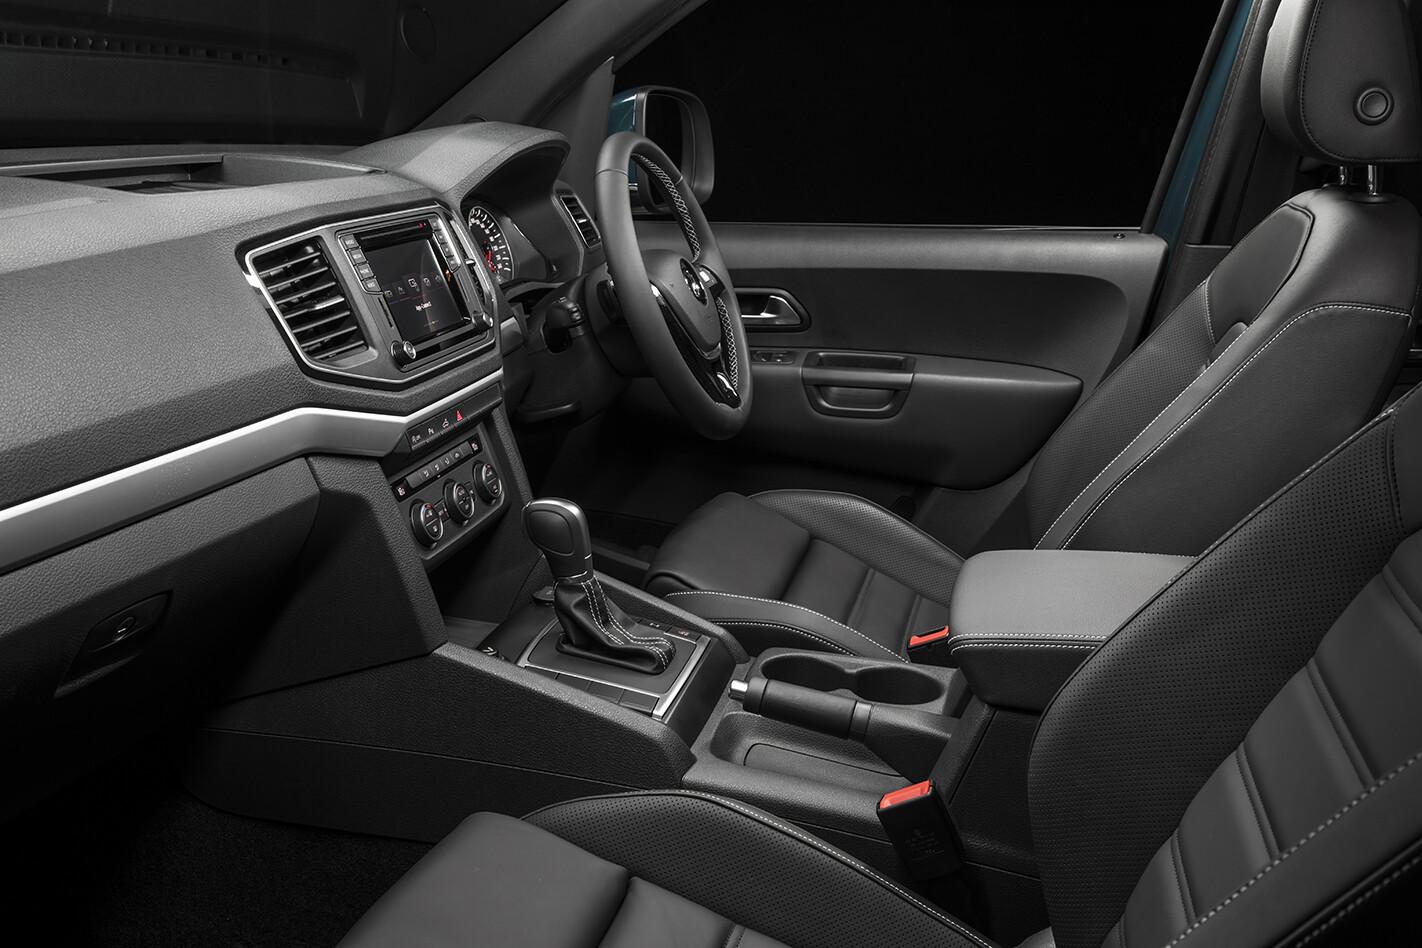 2019 VW Amarok 580 Interior Frontseats Jpg